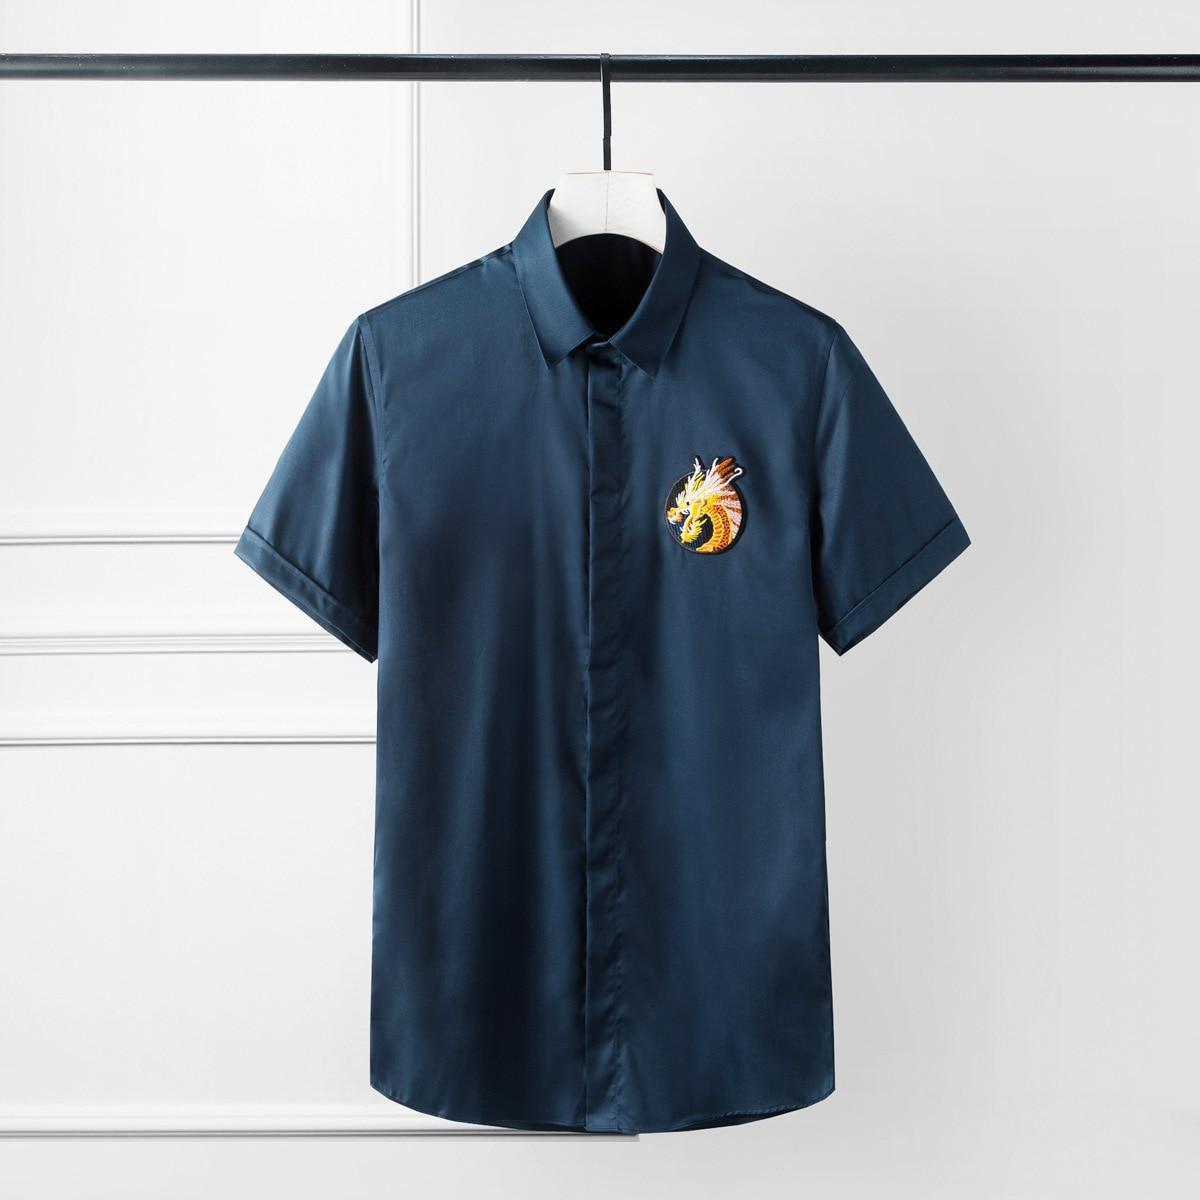 Minglu-قمصان صيفية للرجال ، مقاس كبير ، 4xl ، لون سادة ، مقاس نحيف ، قمصان فاخرة مع تطريز ، أكمام طويلة ، قميص رجالي